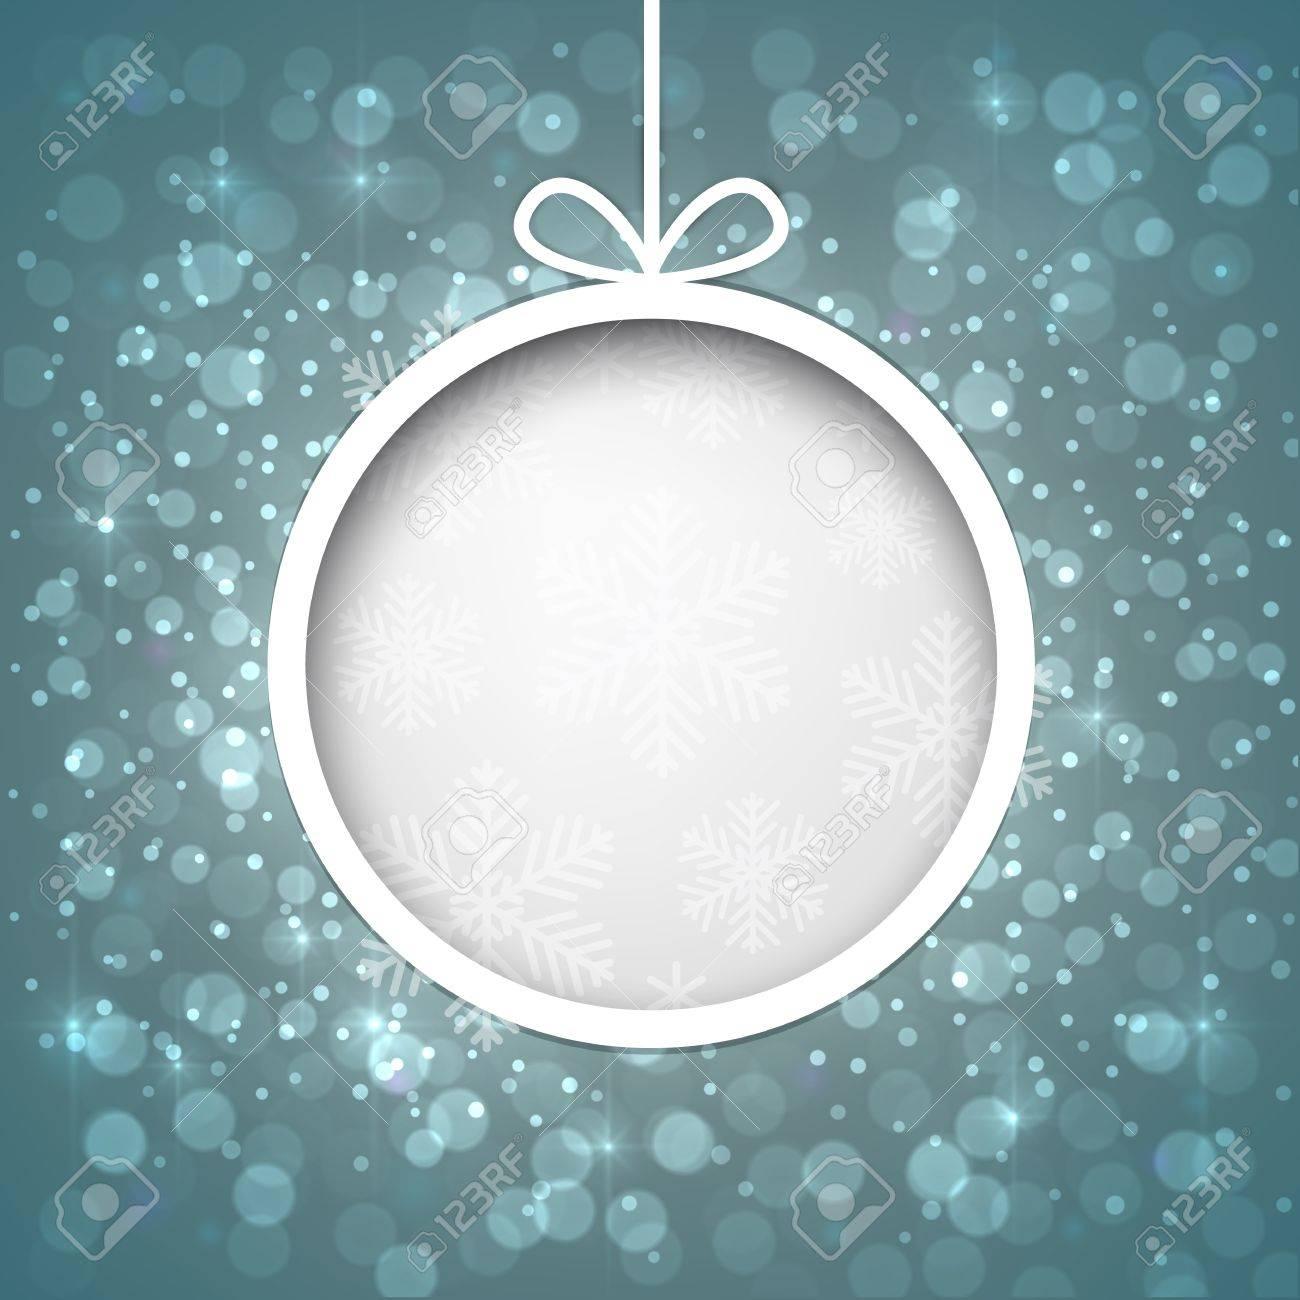 Glowing shiny christmas ball background  Vector eps10 Stock Vector - 16279378